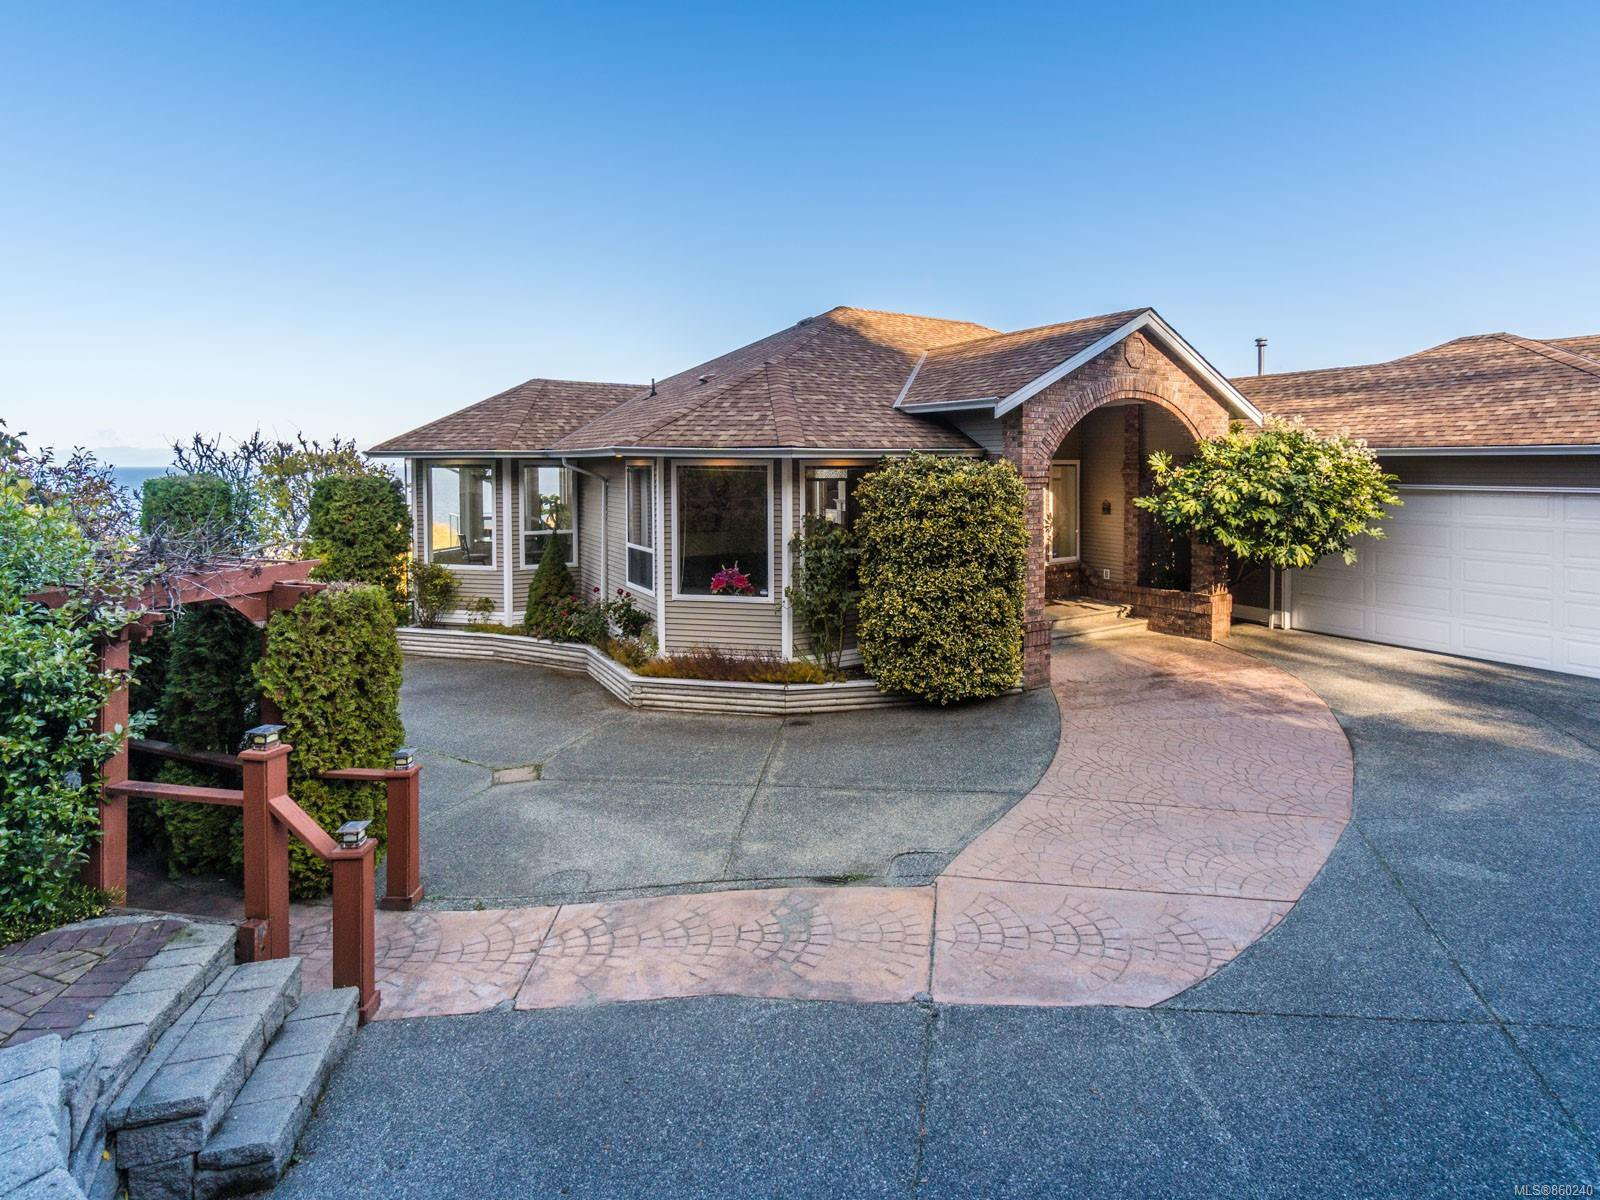 Main Photo: 5242 Laguna Way in : Na North Nanaimo House for sale (Nanaimo)  : MLS®# 860240